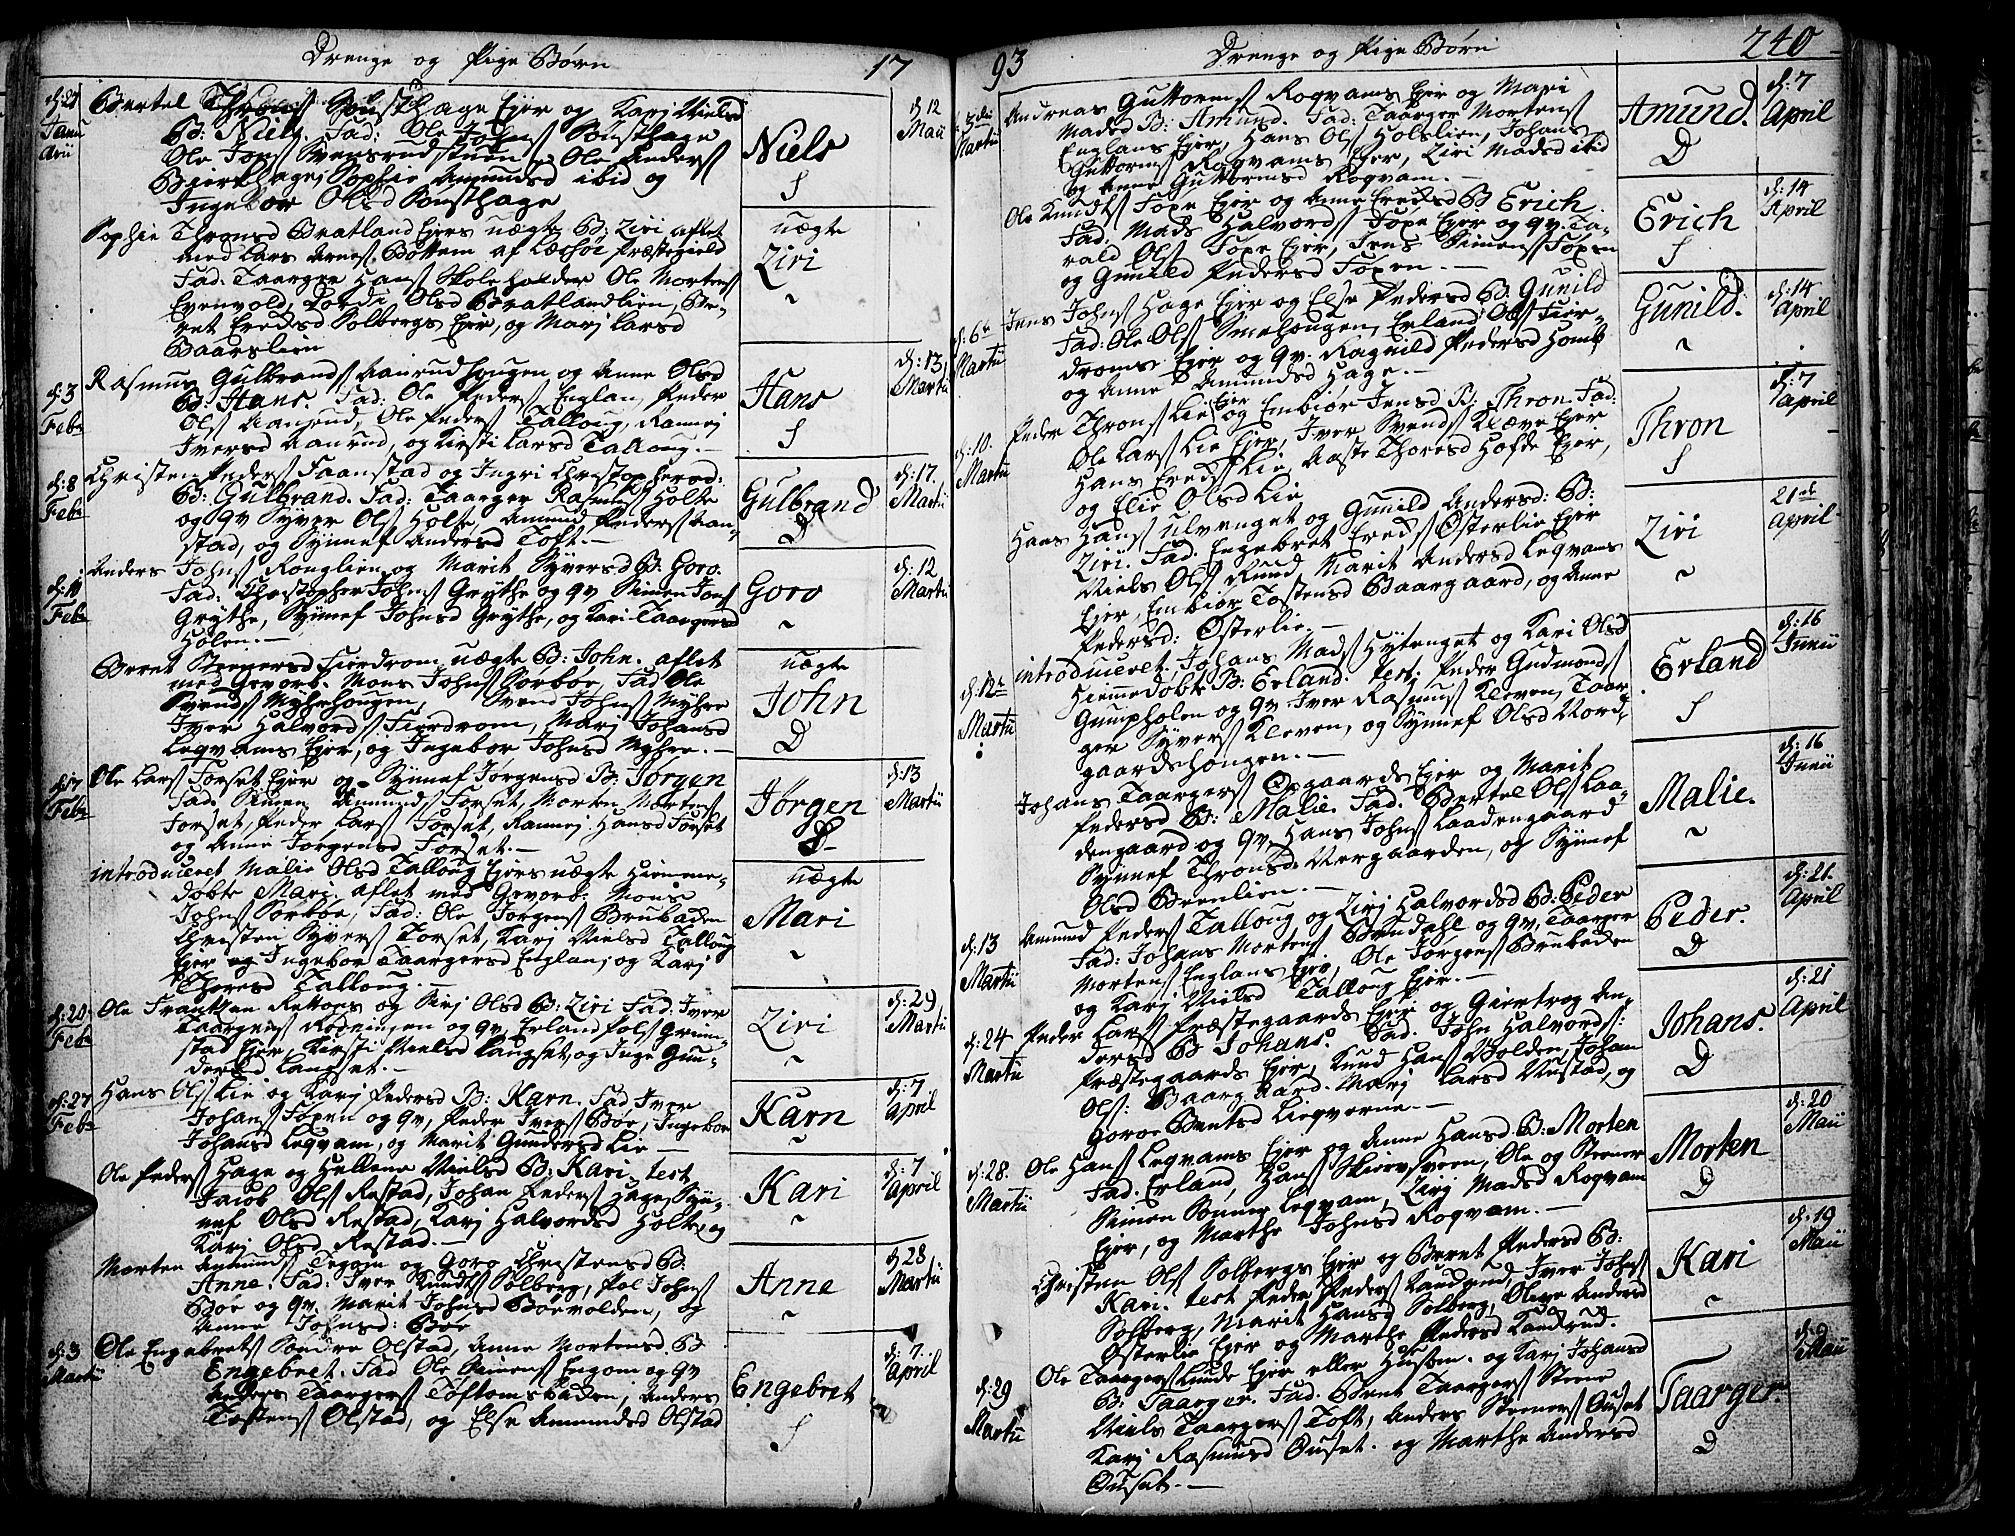 SAH, Gausdal prestekontor, Ministerialbok nr. 3, 1758-1809, s. 240